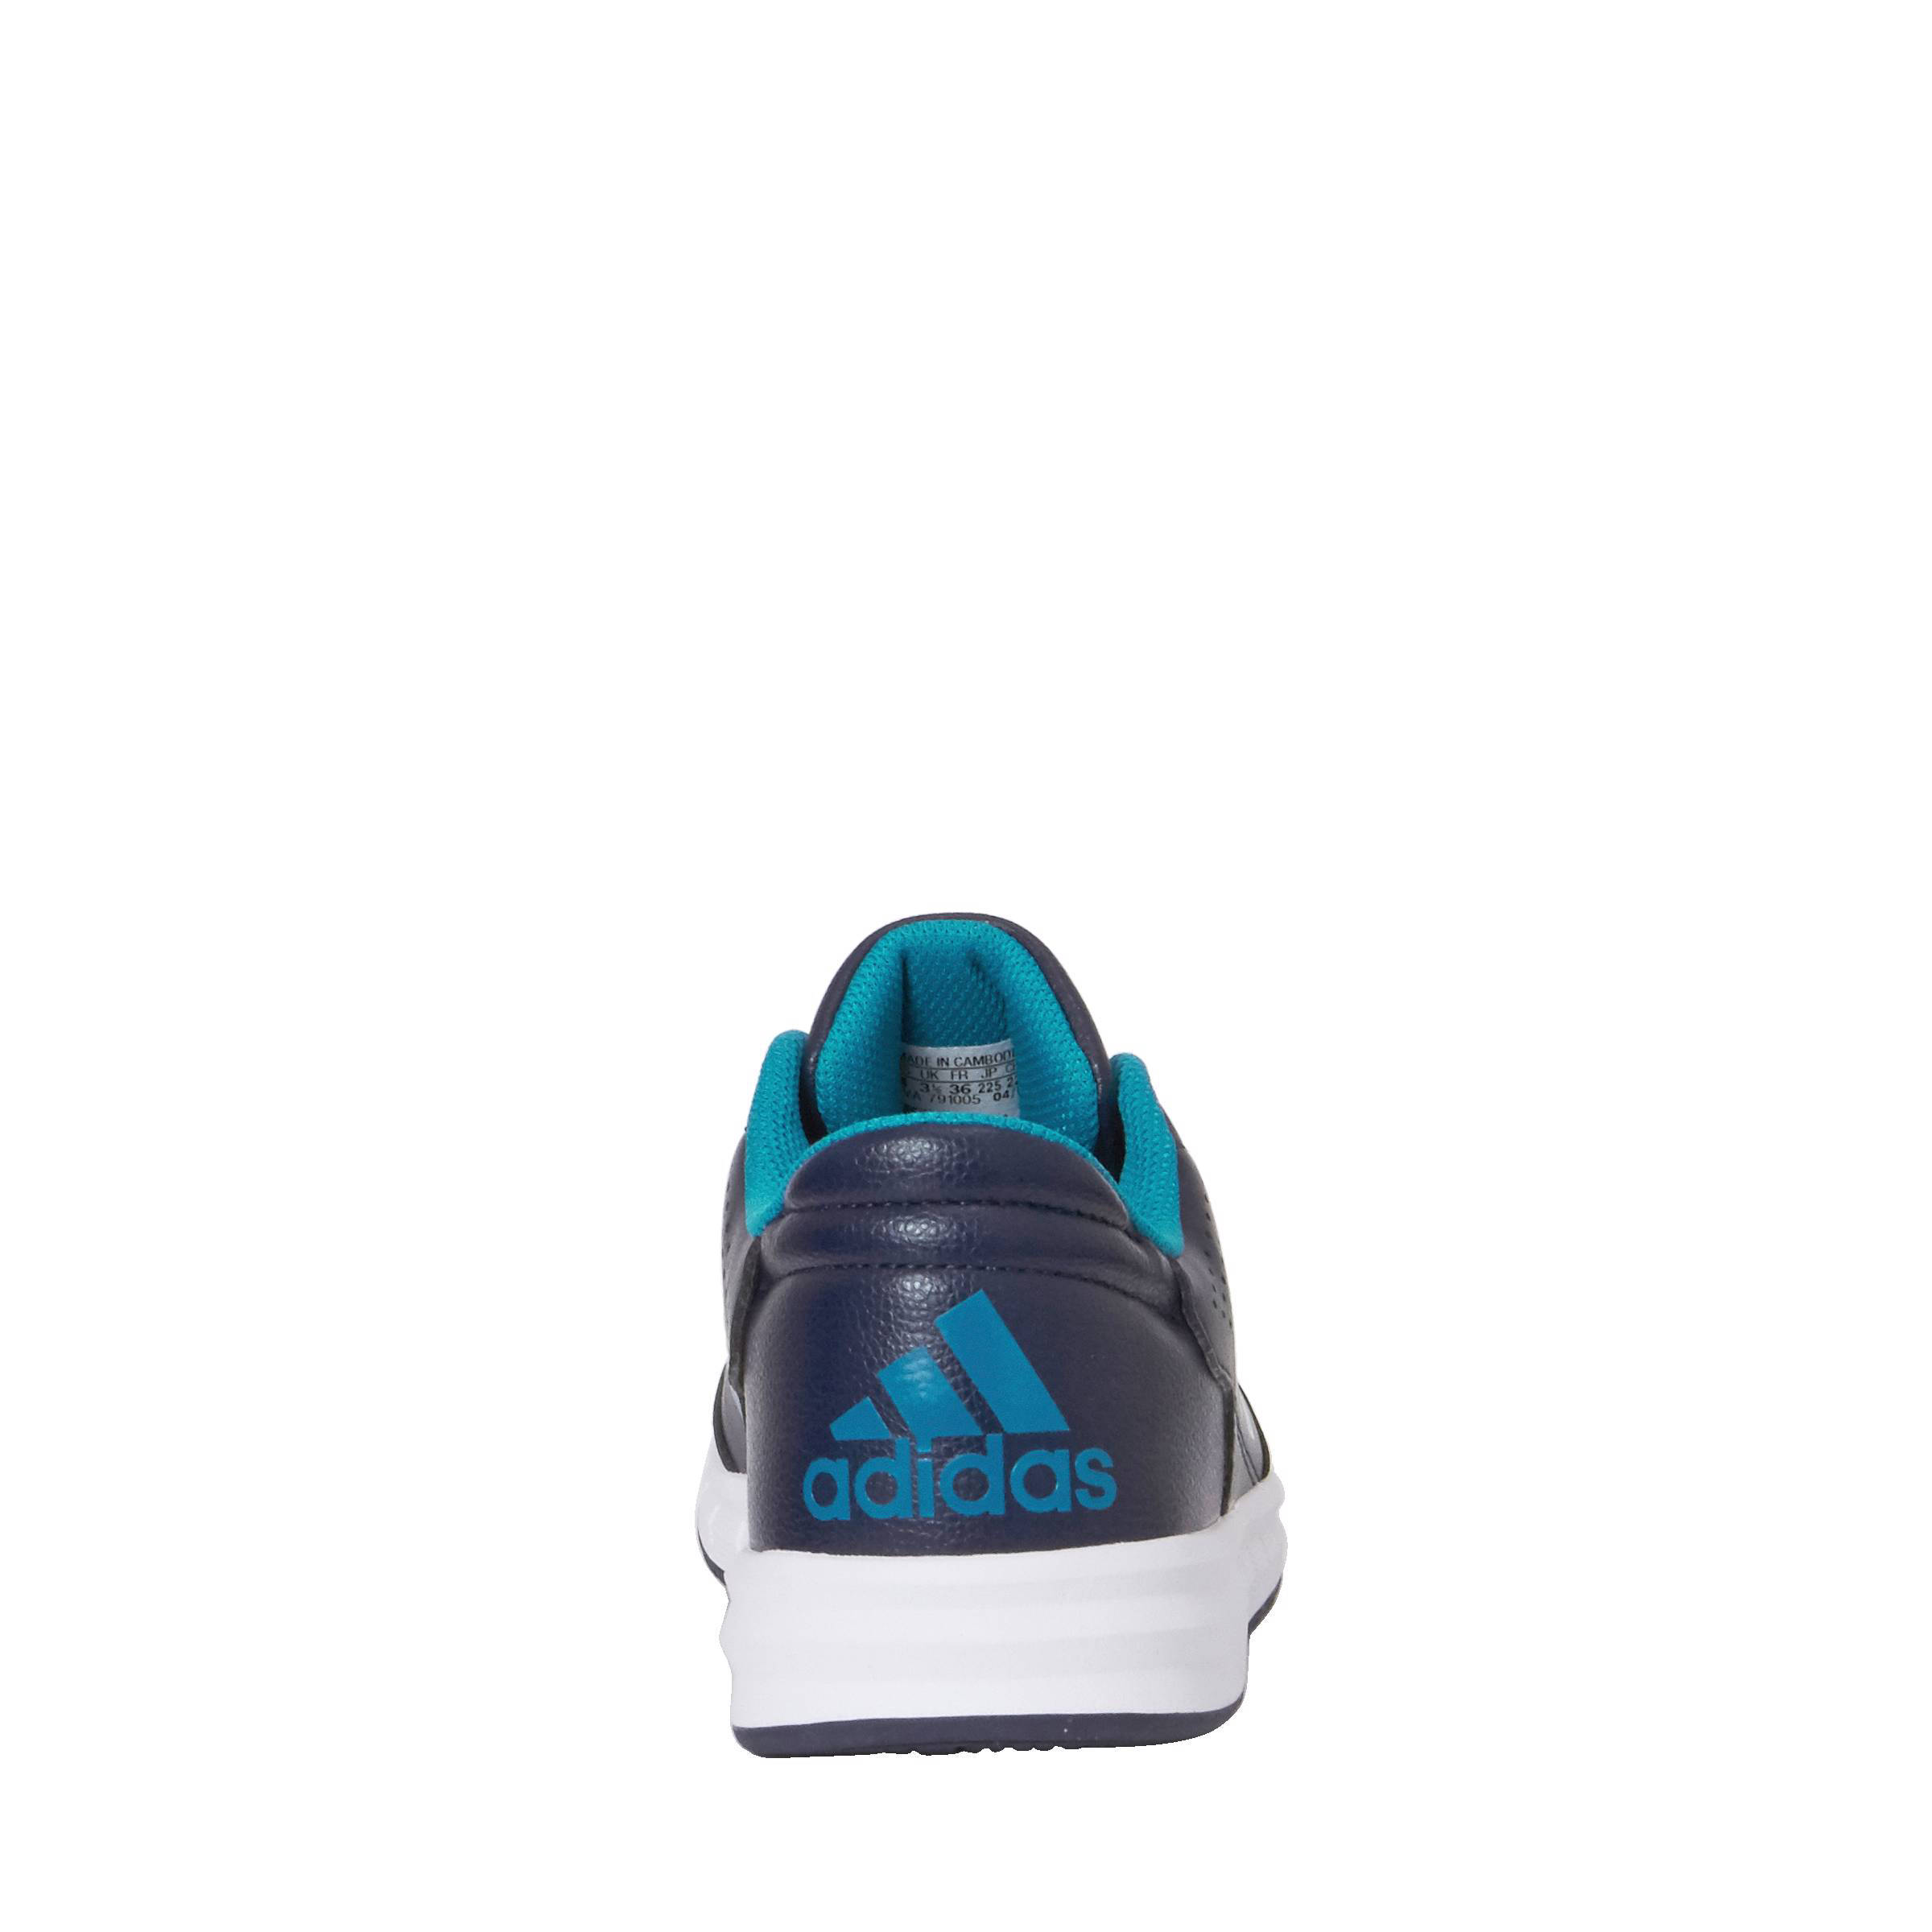 ab498201c88 adidas performance kids AltaSport sportschoenen   wehkamp